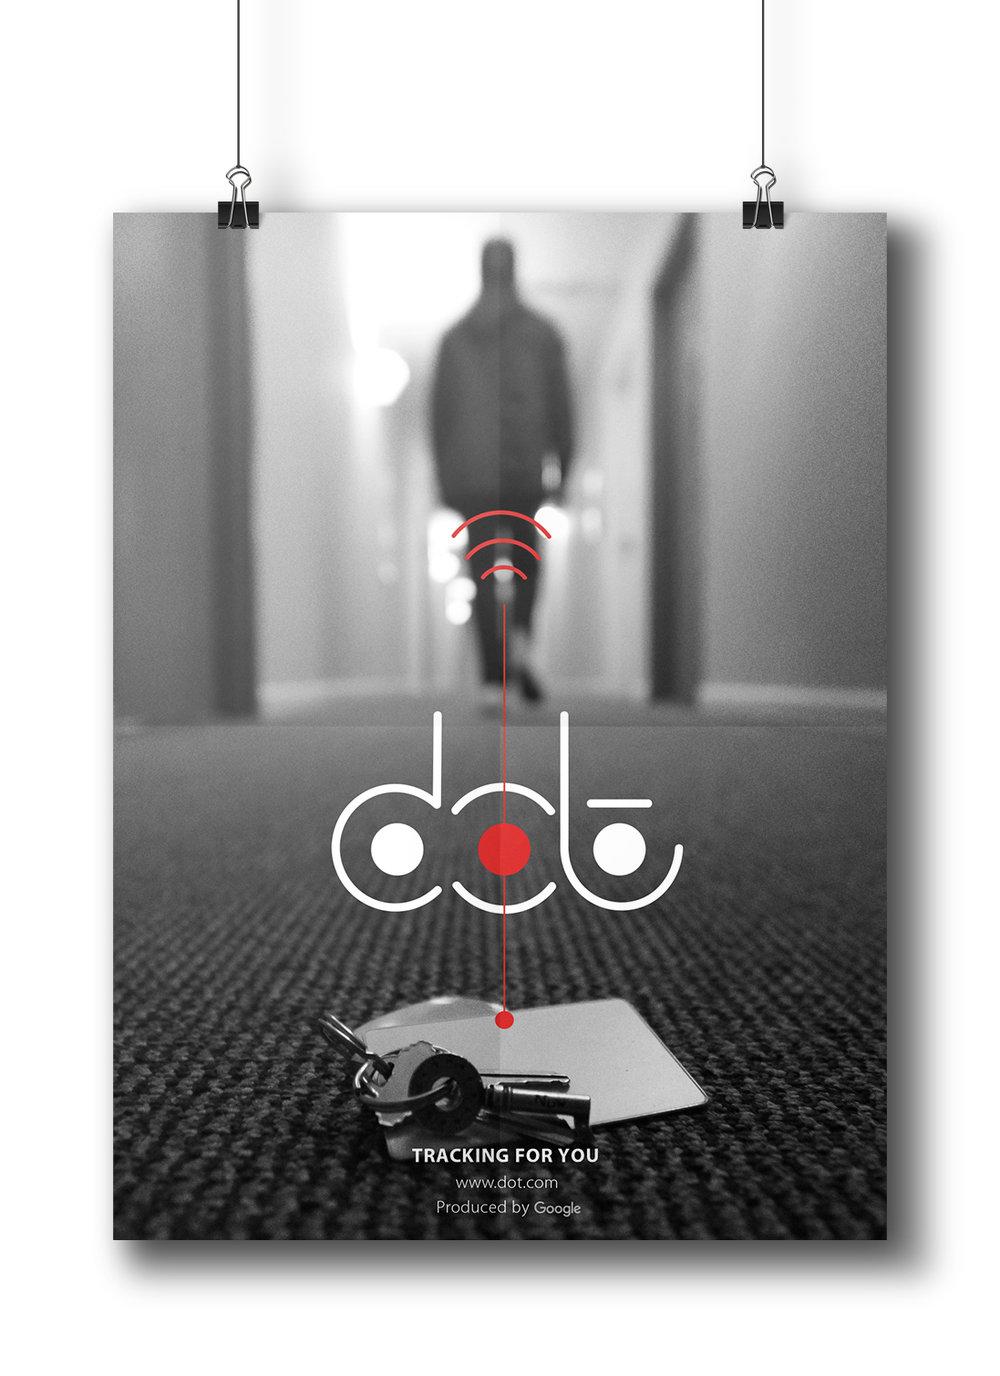 poster_mockup_1.jpg